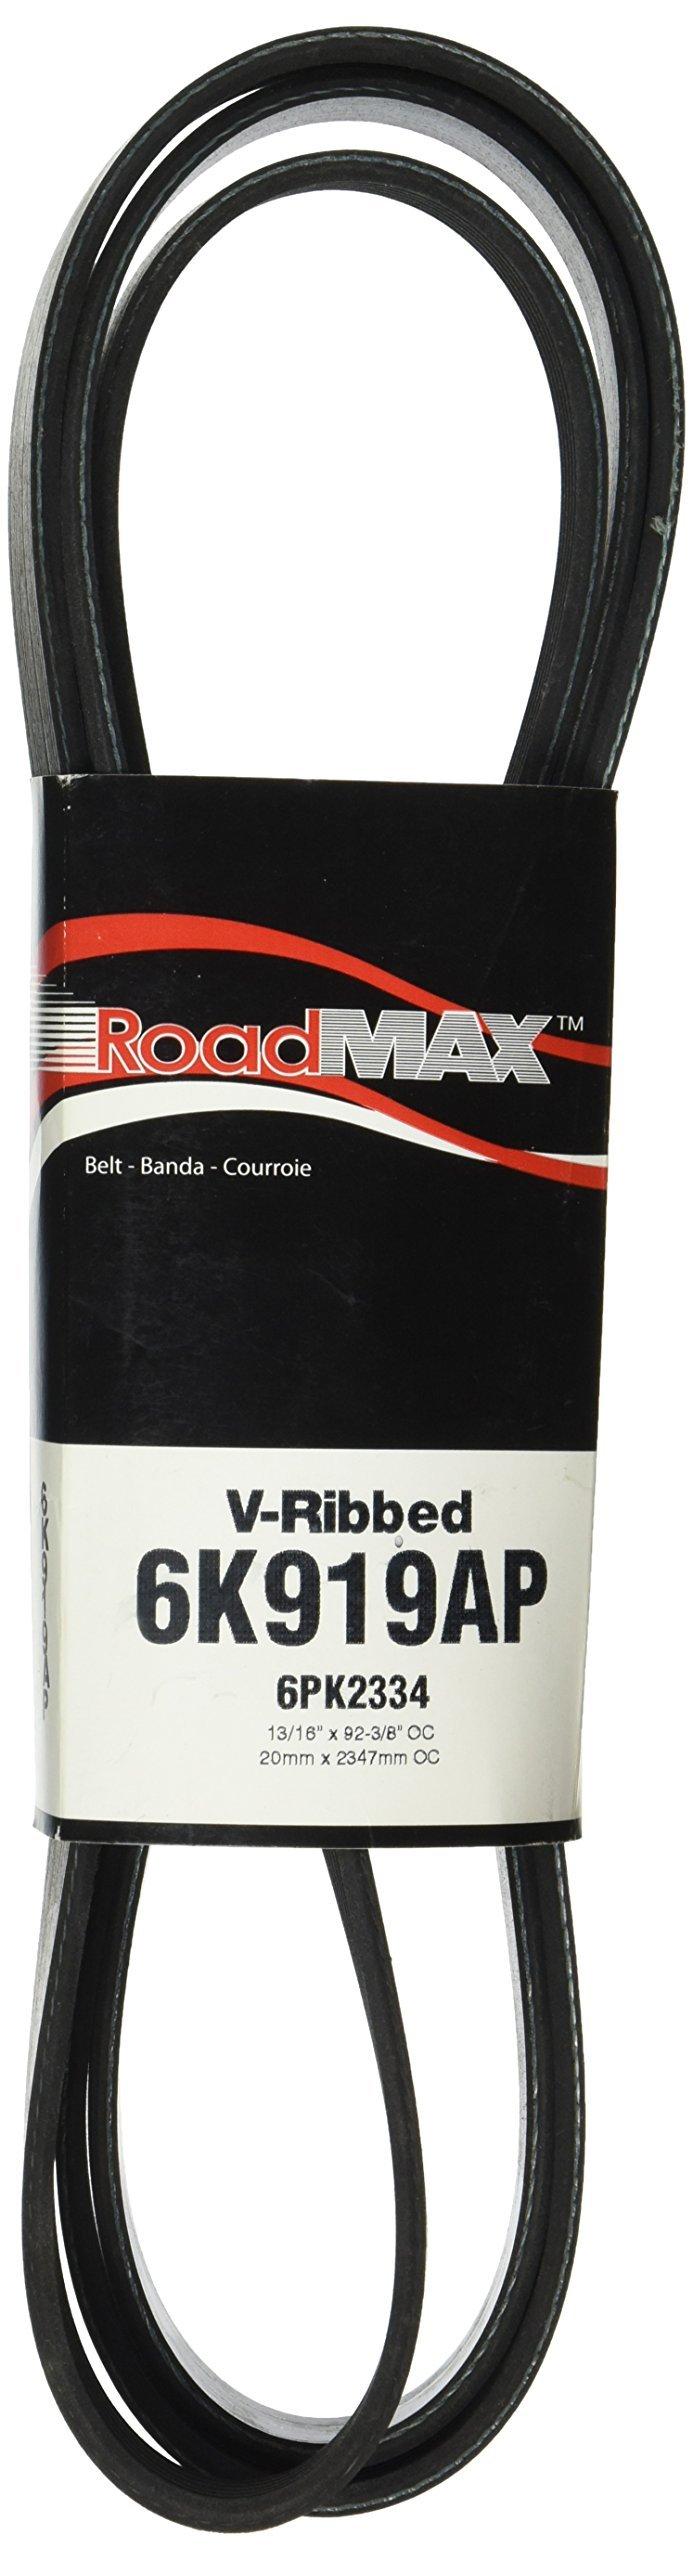 Roadmax 6K919AP Serpentine Belt